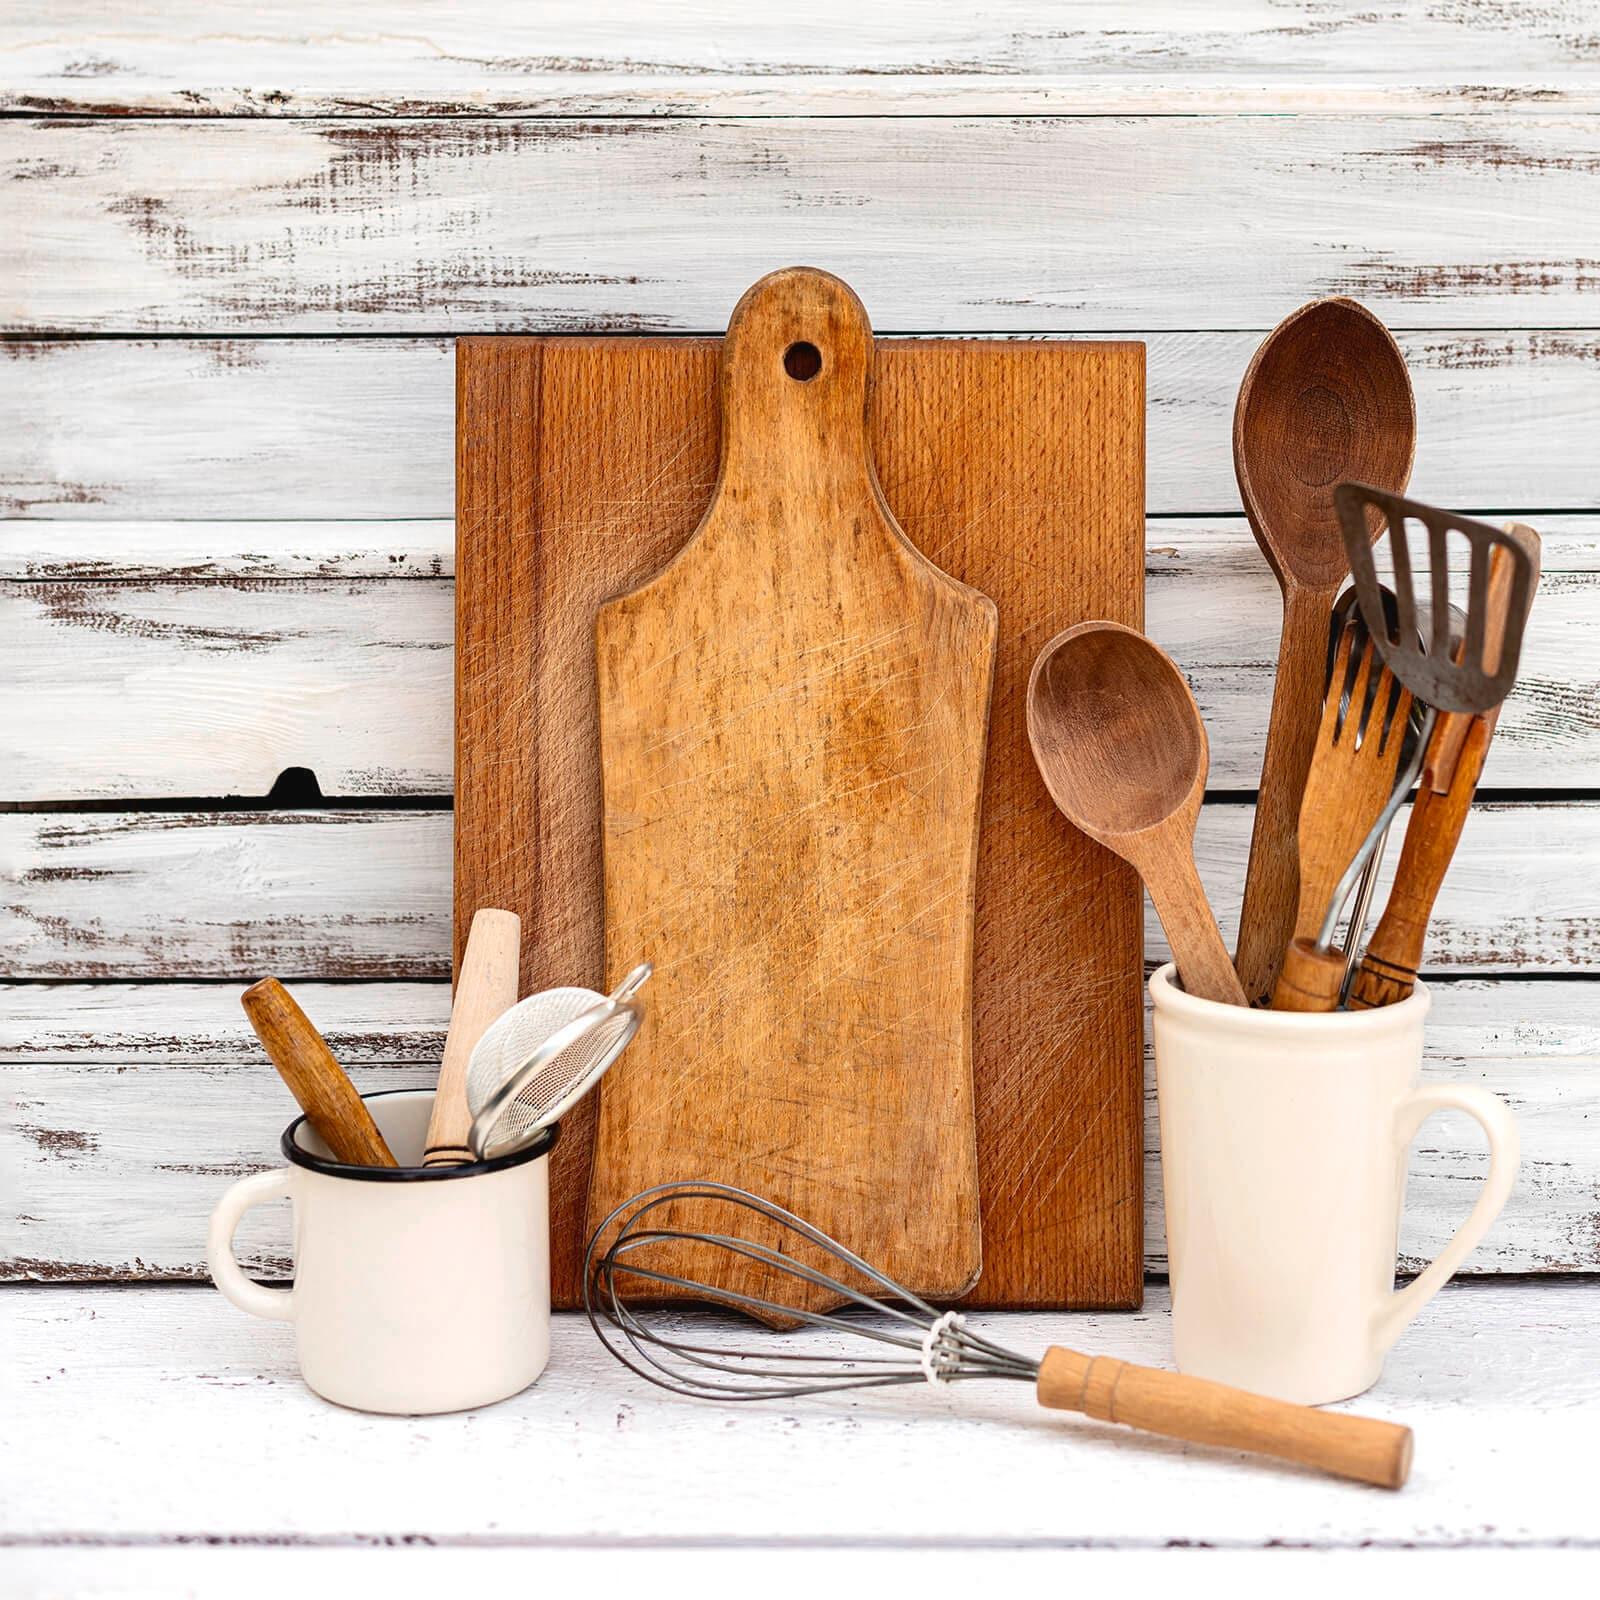 Talenan dan sutil kayu di atas papan kayu putih